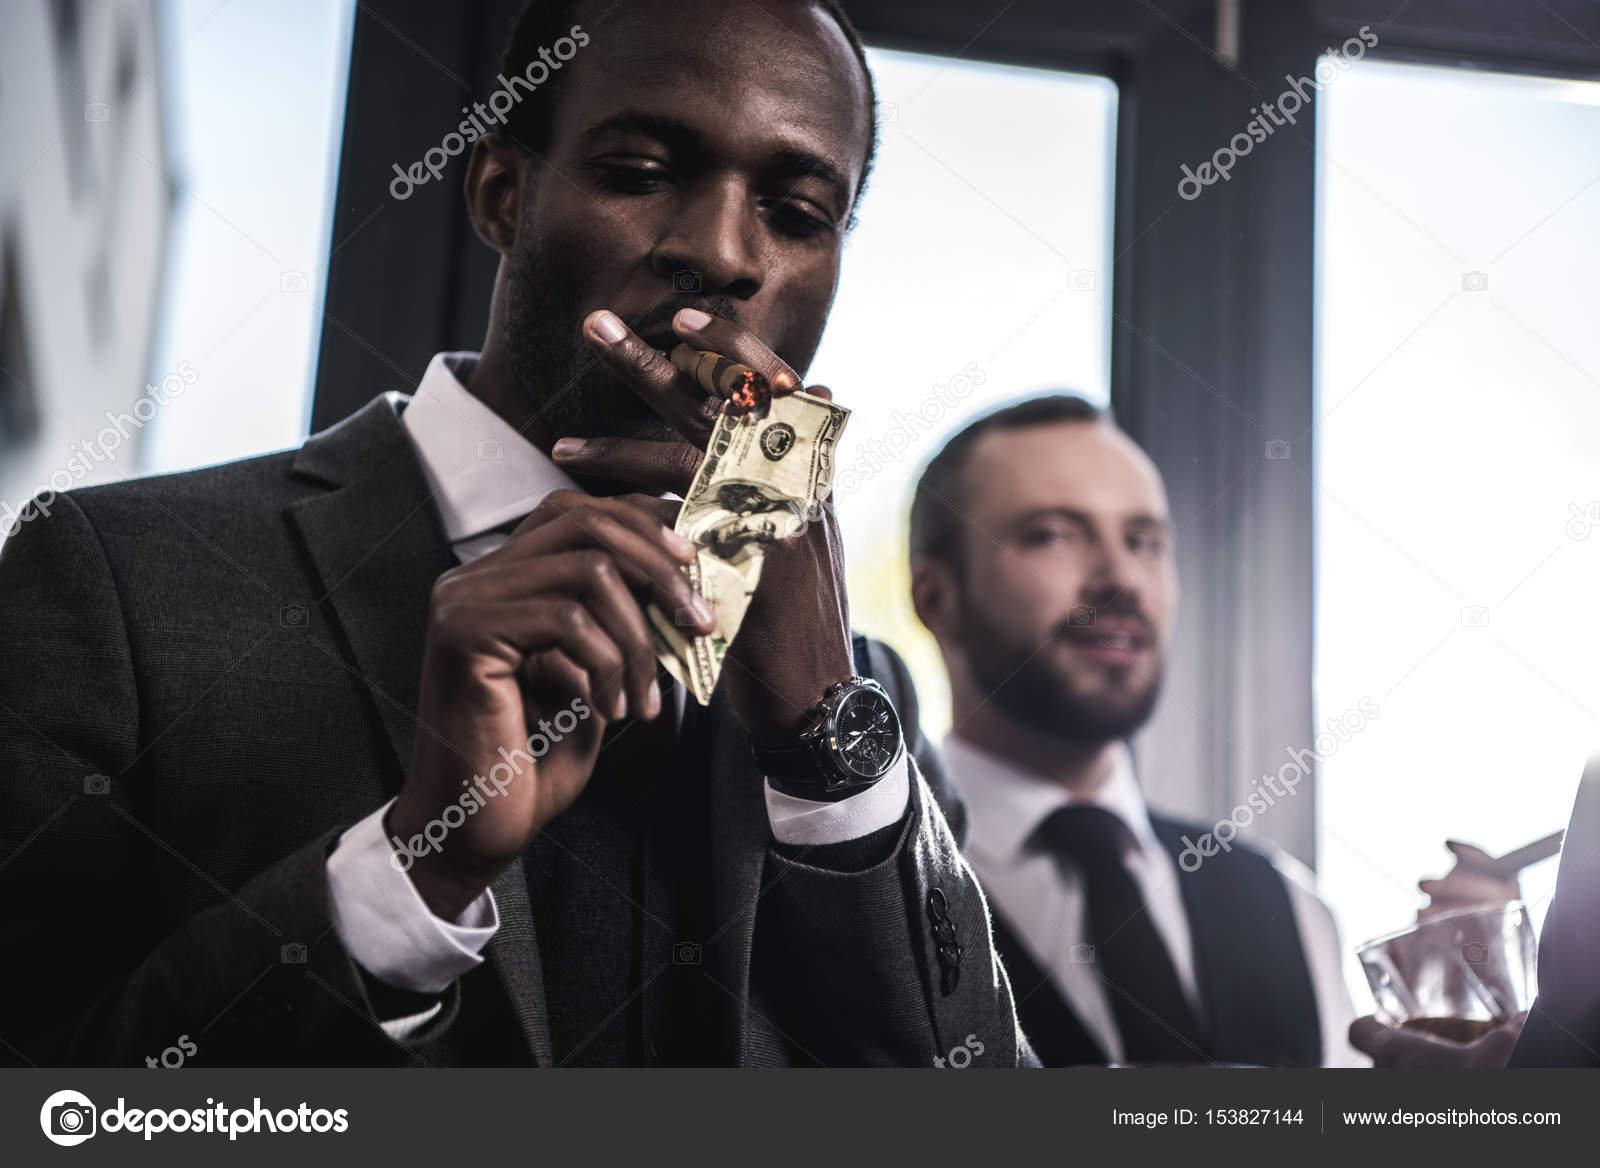 Vertrouwen zakenman verlichting sigaar met dollar biljet binnenshuis ...